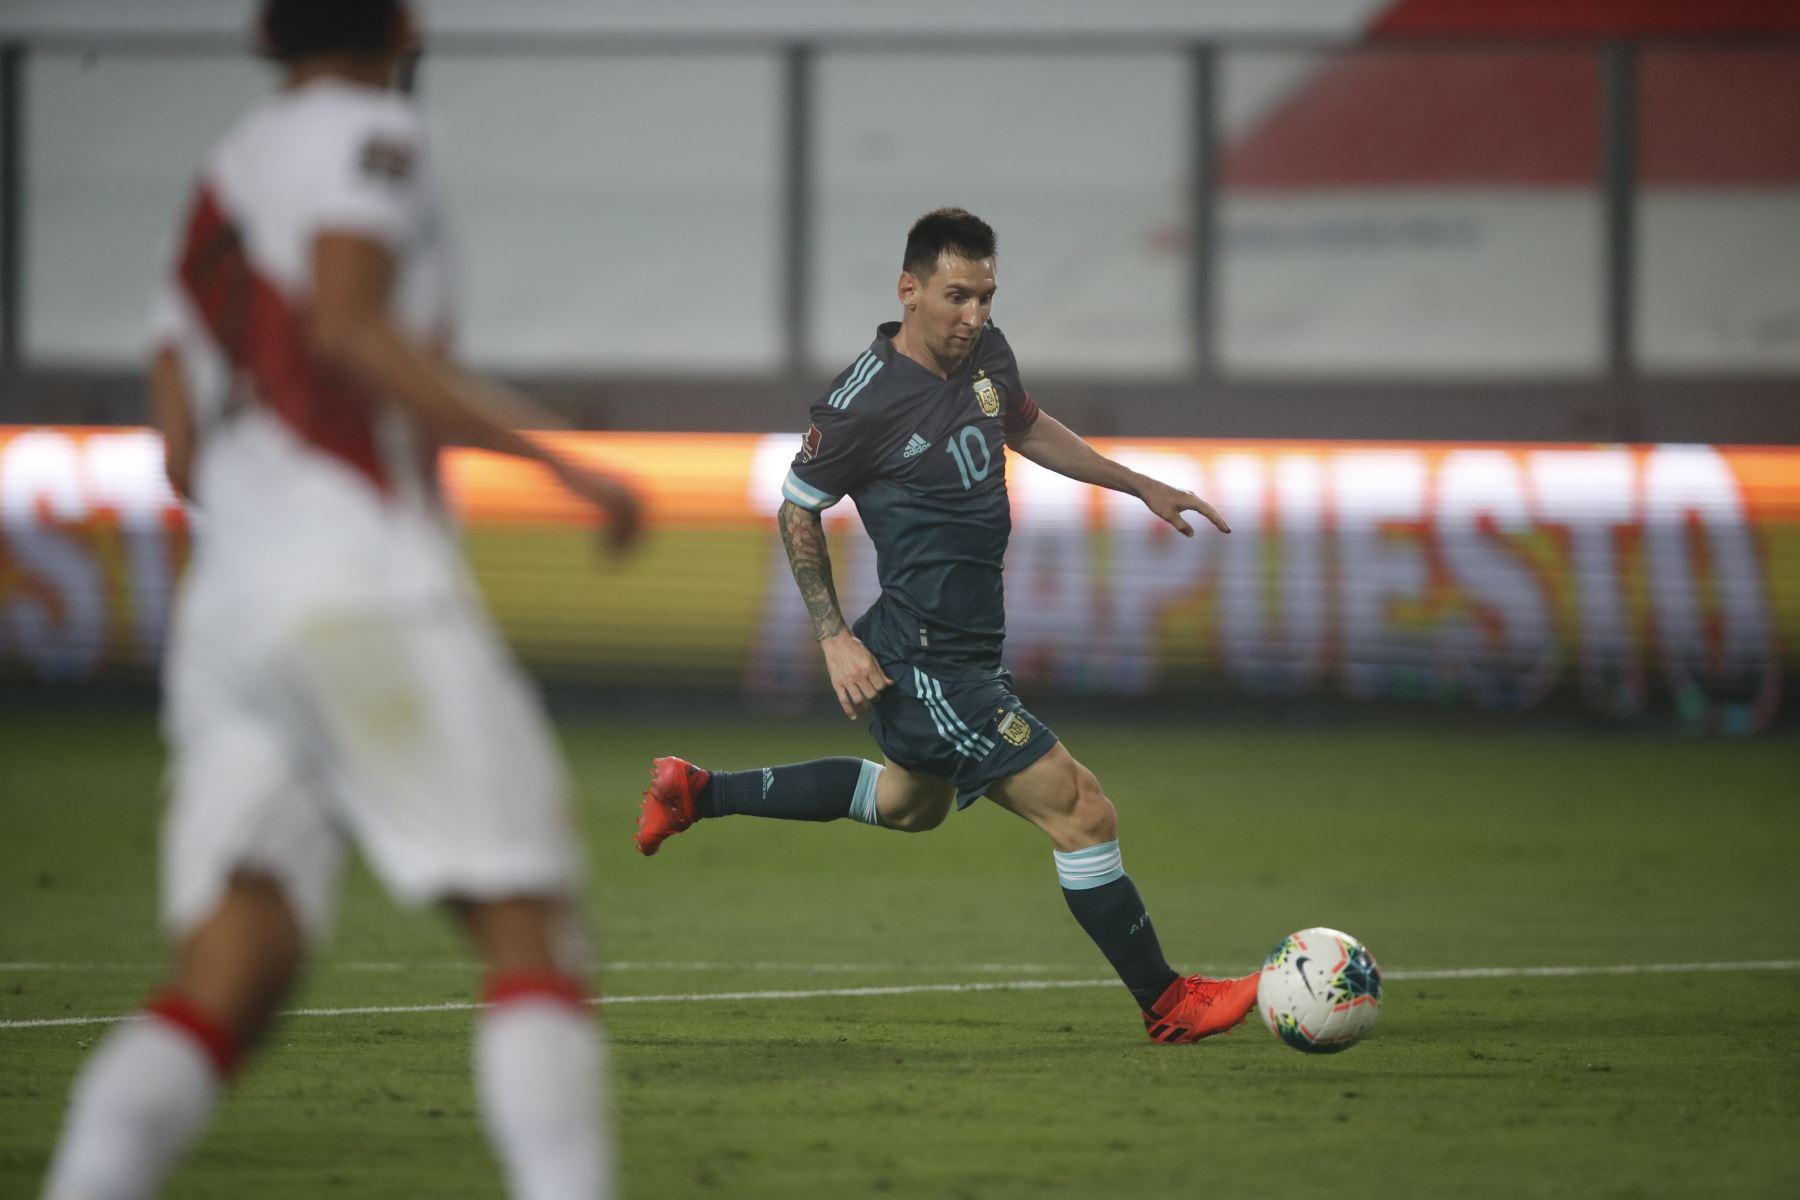 Lionel Messi domina el balón. Argentina derrota 2 a 0 a la selección de Perú.  Foto: Pool FPF